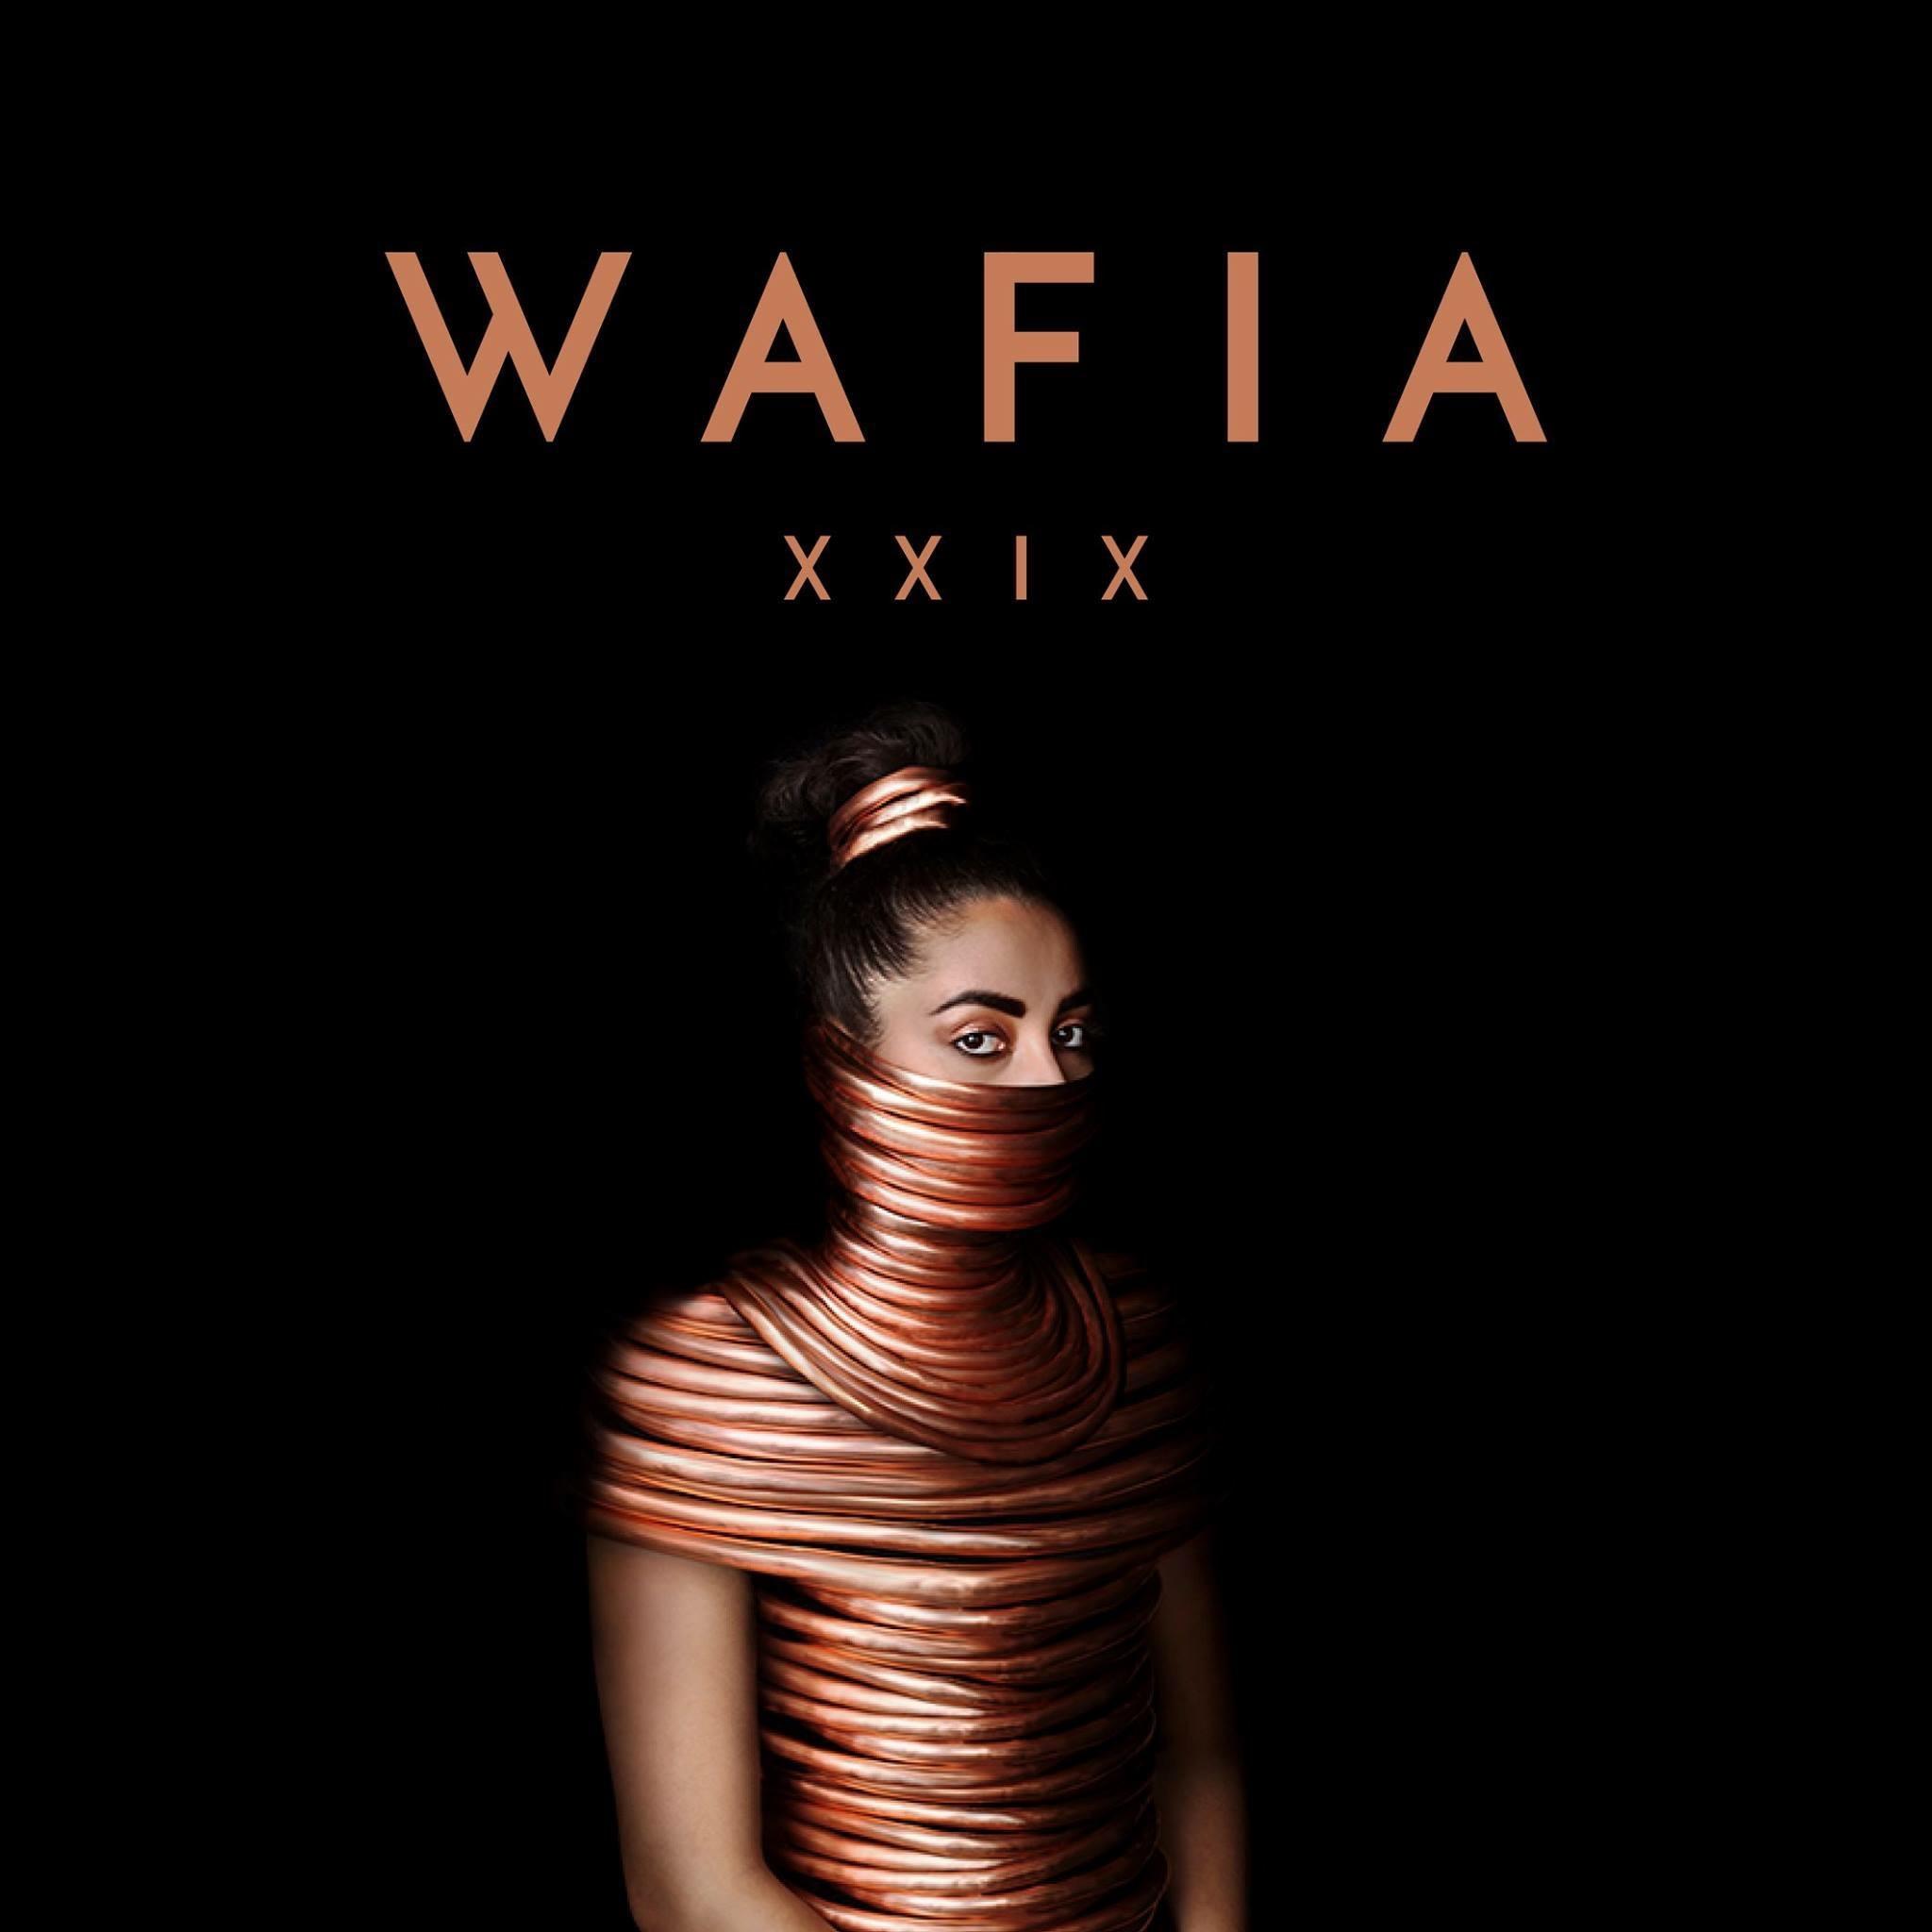 WAFIA DEBUT EP XXIX